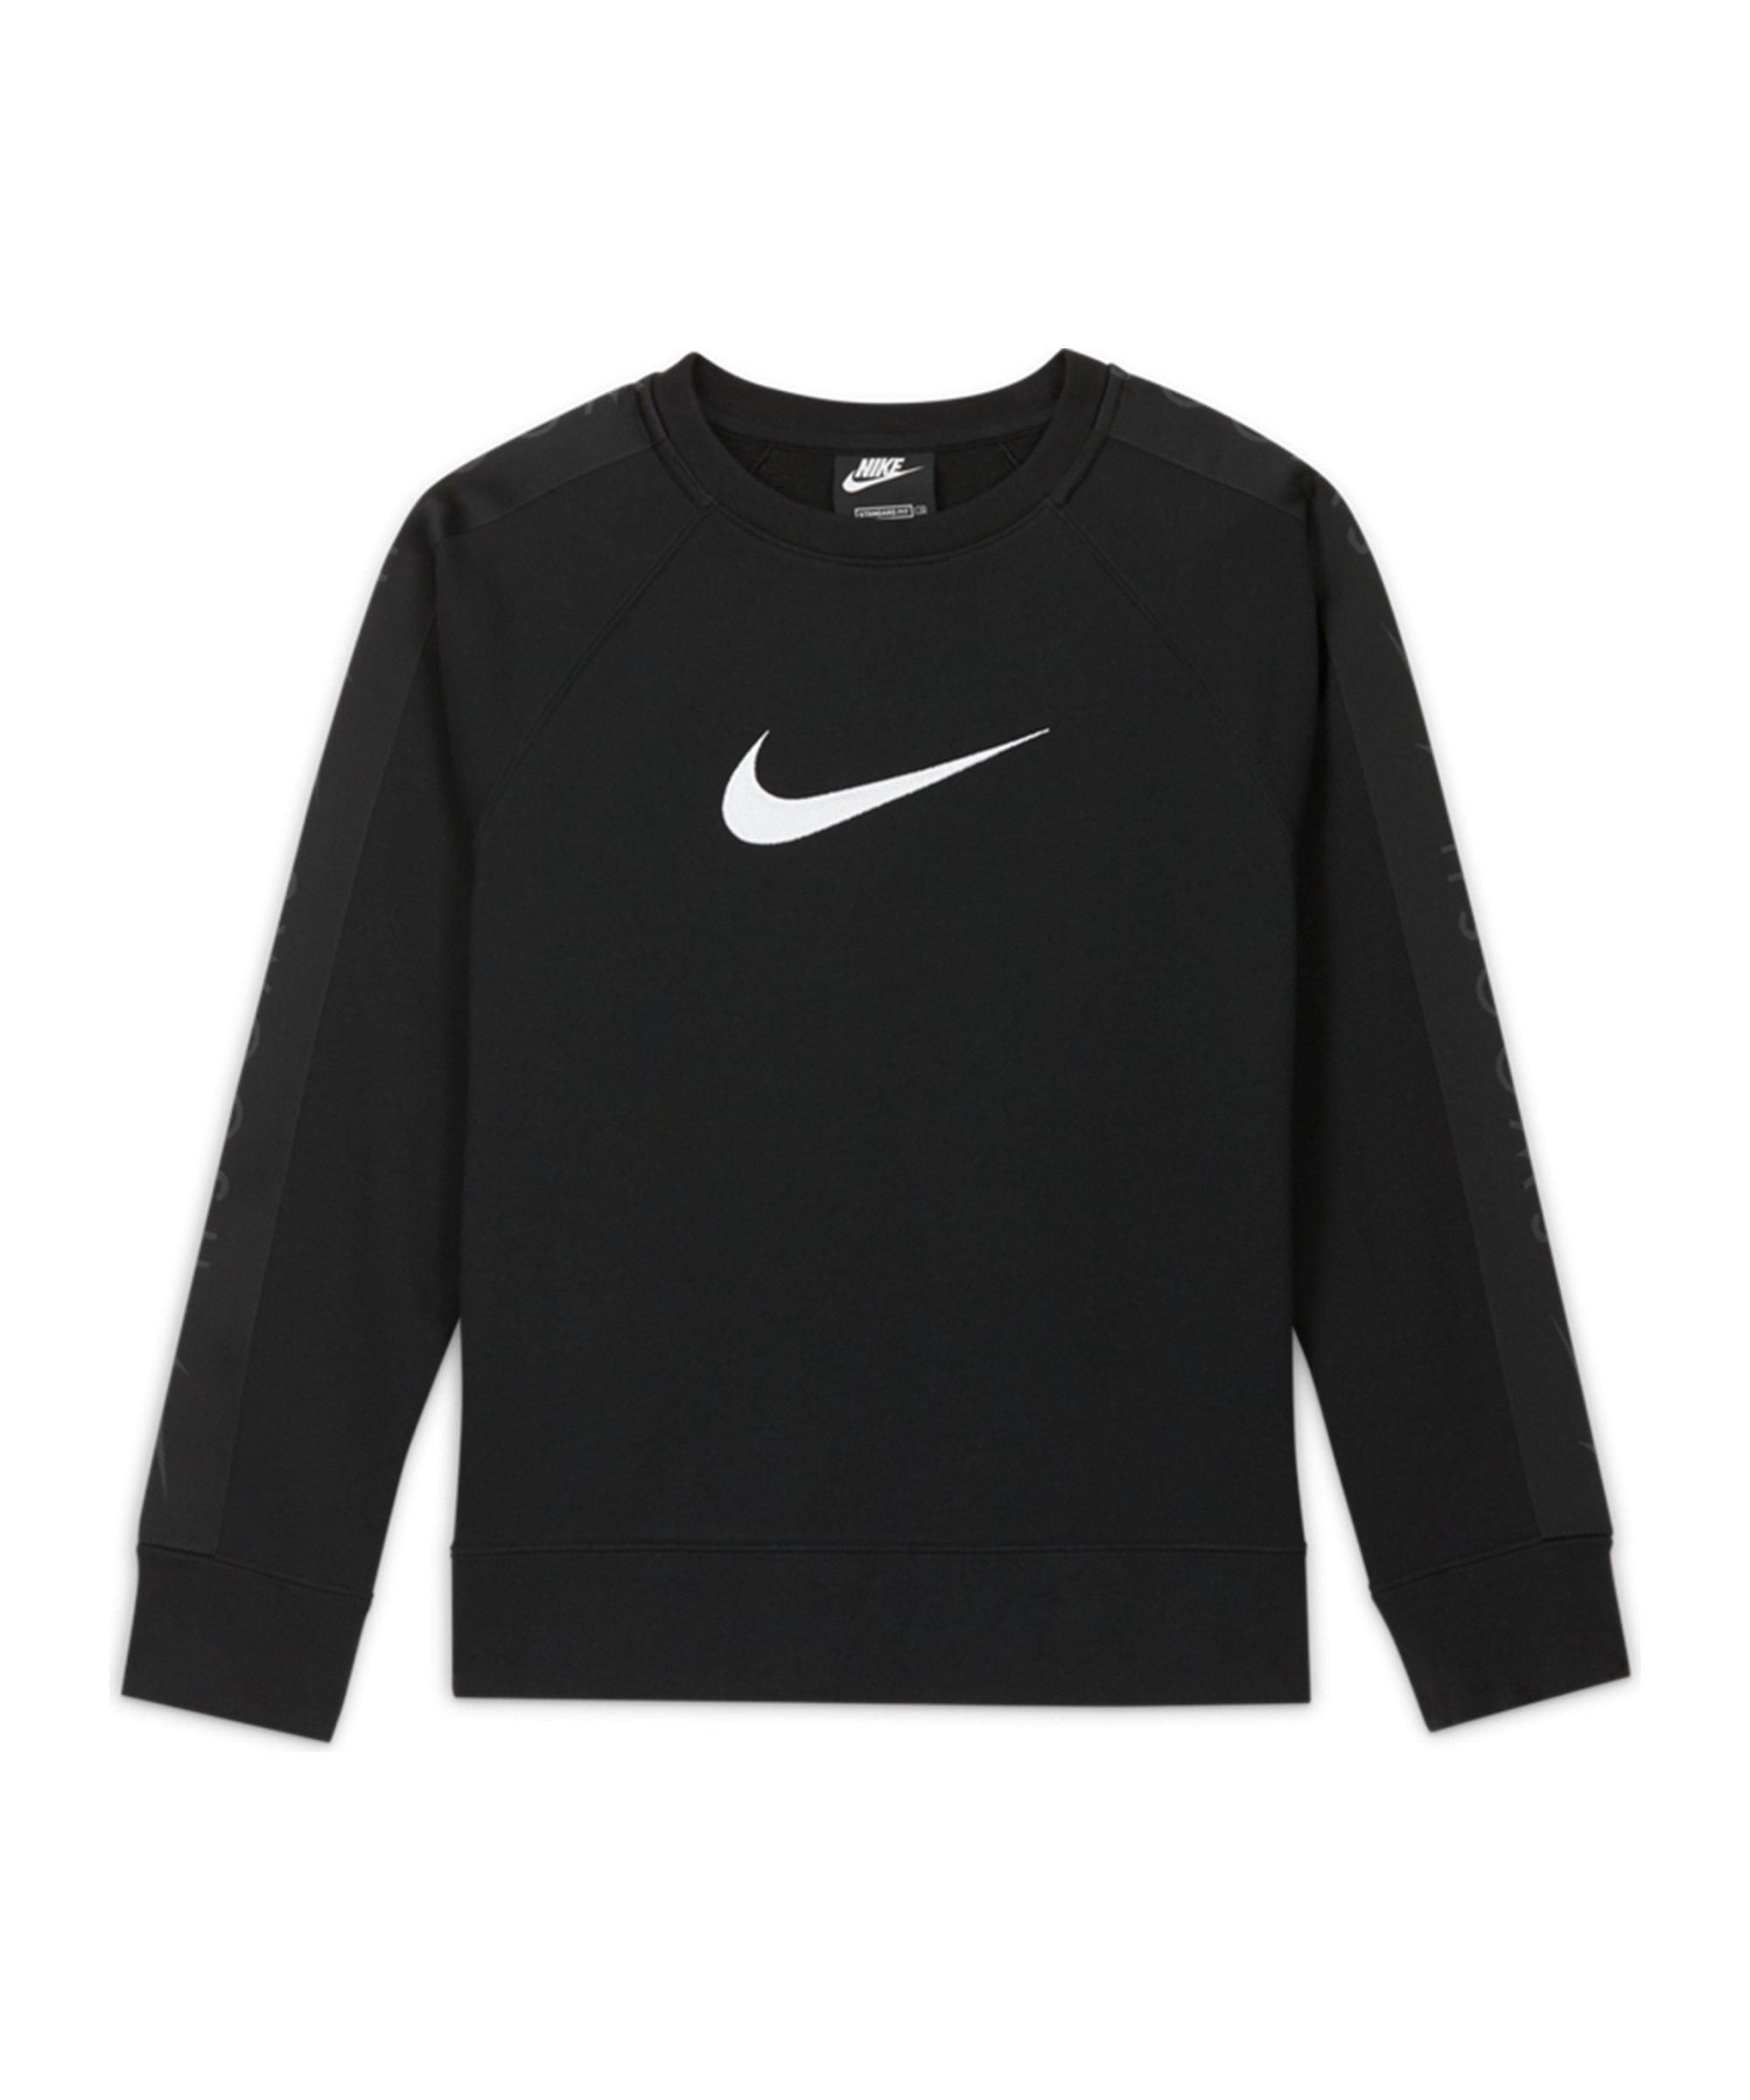 Nike Fleece Swoosh Sweatshirt Kids Schwarz F010 - schwarz